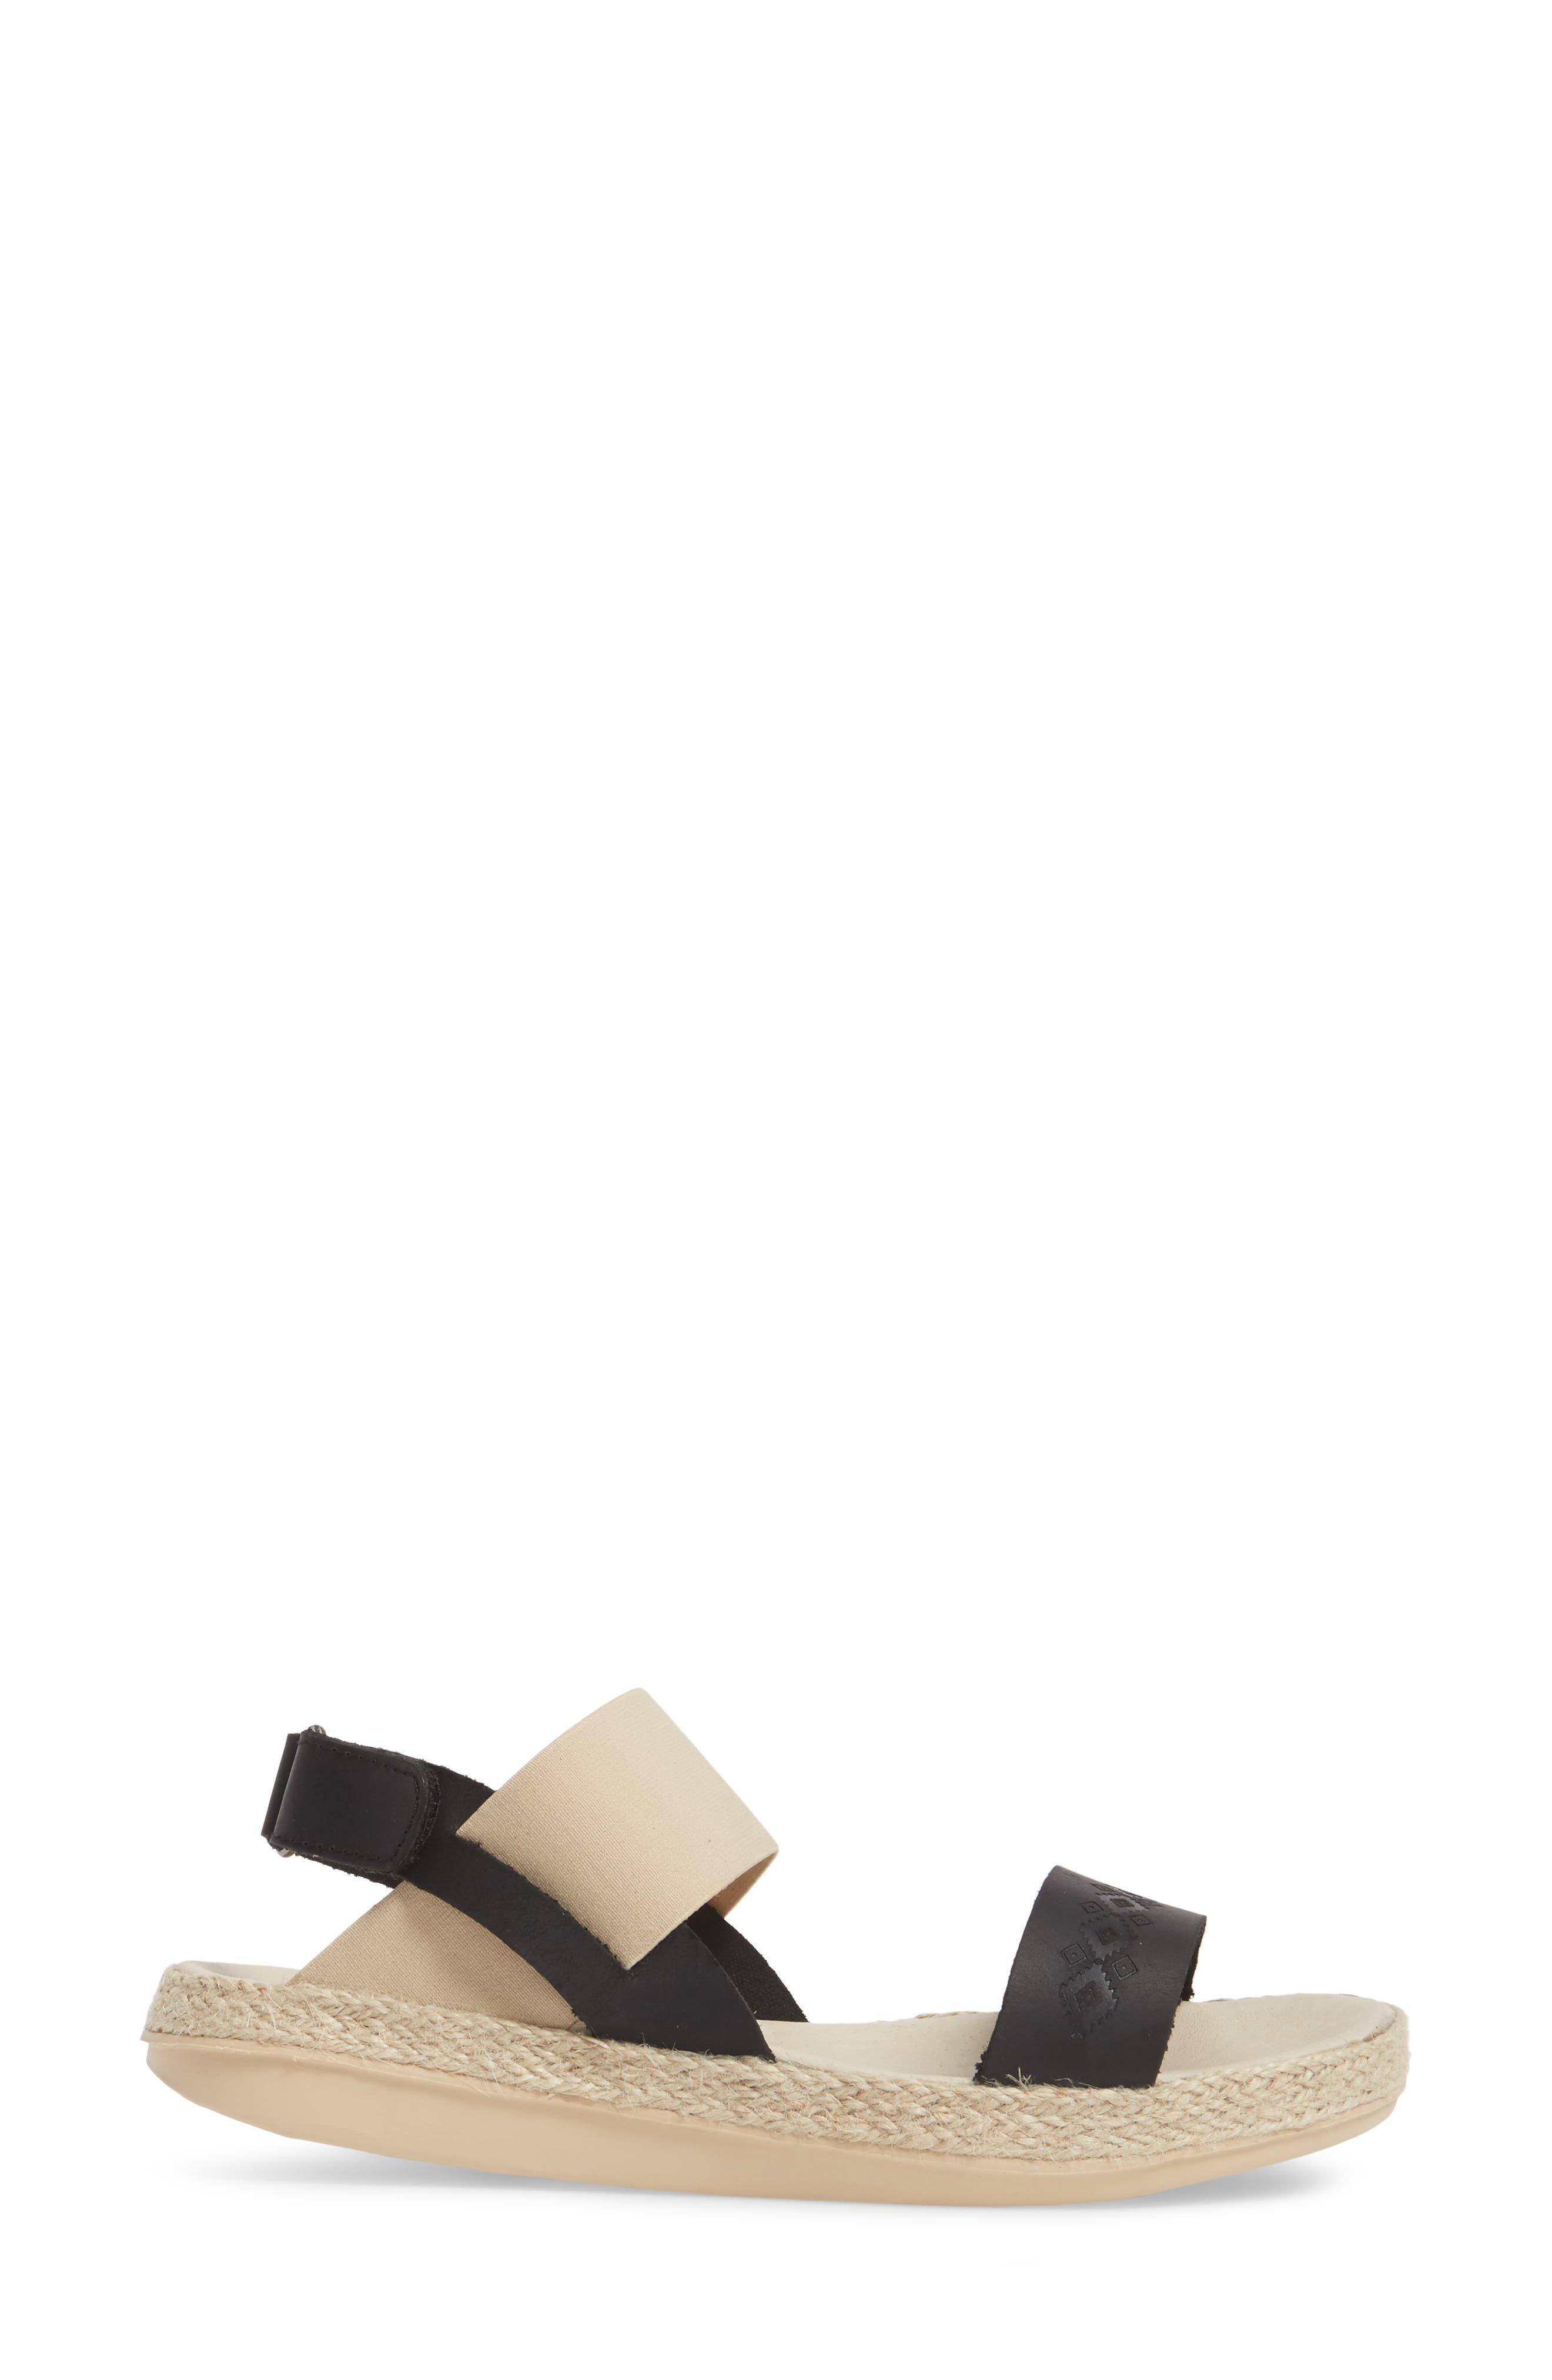 Tobermory Sandal,                             Alternate thumbnail 3, color,                             Black Leather